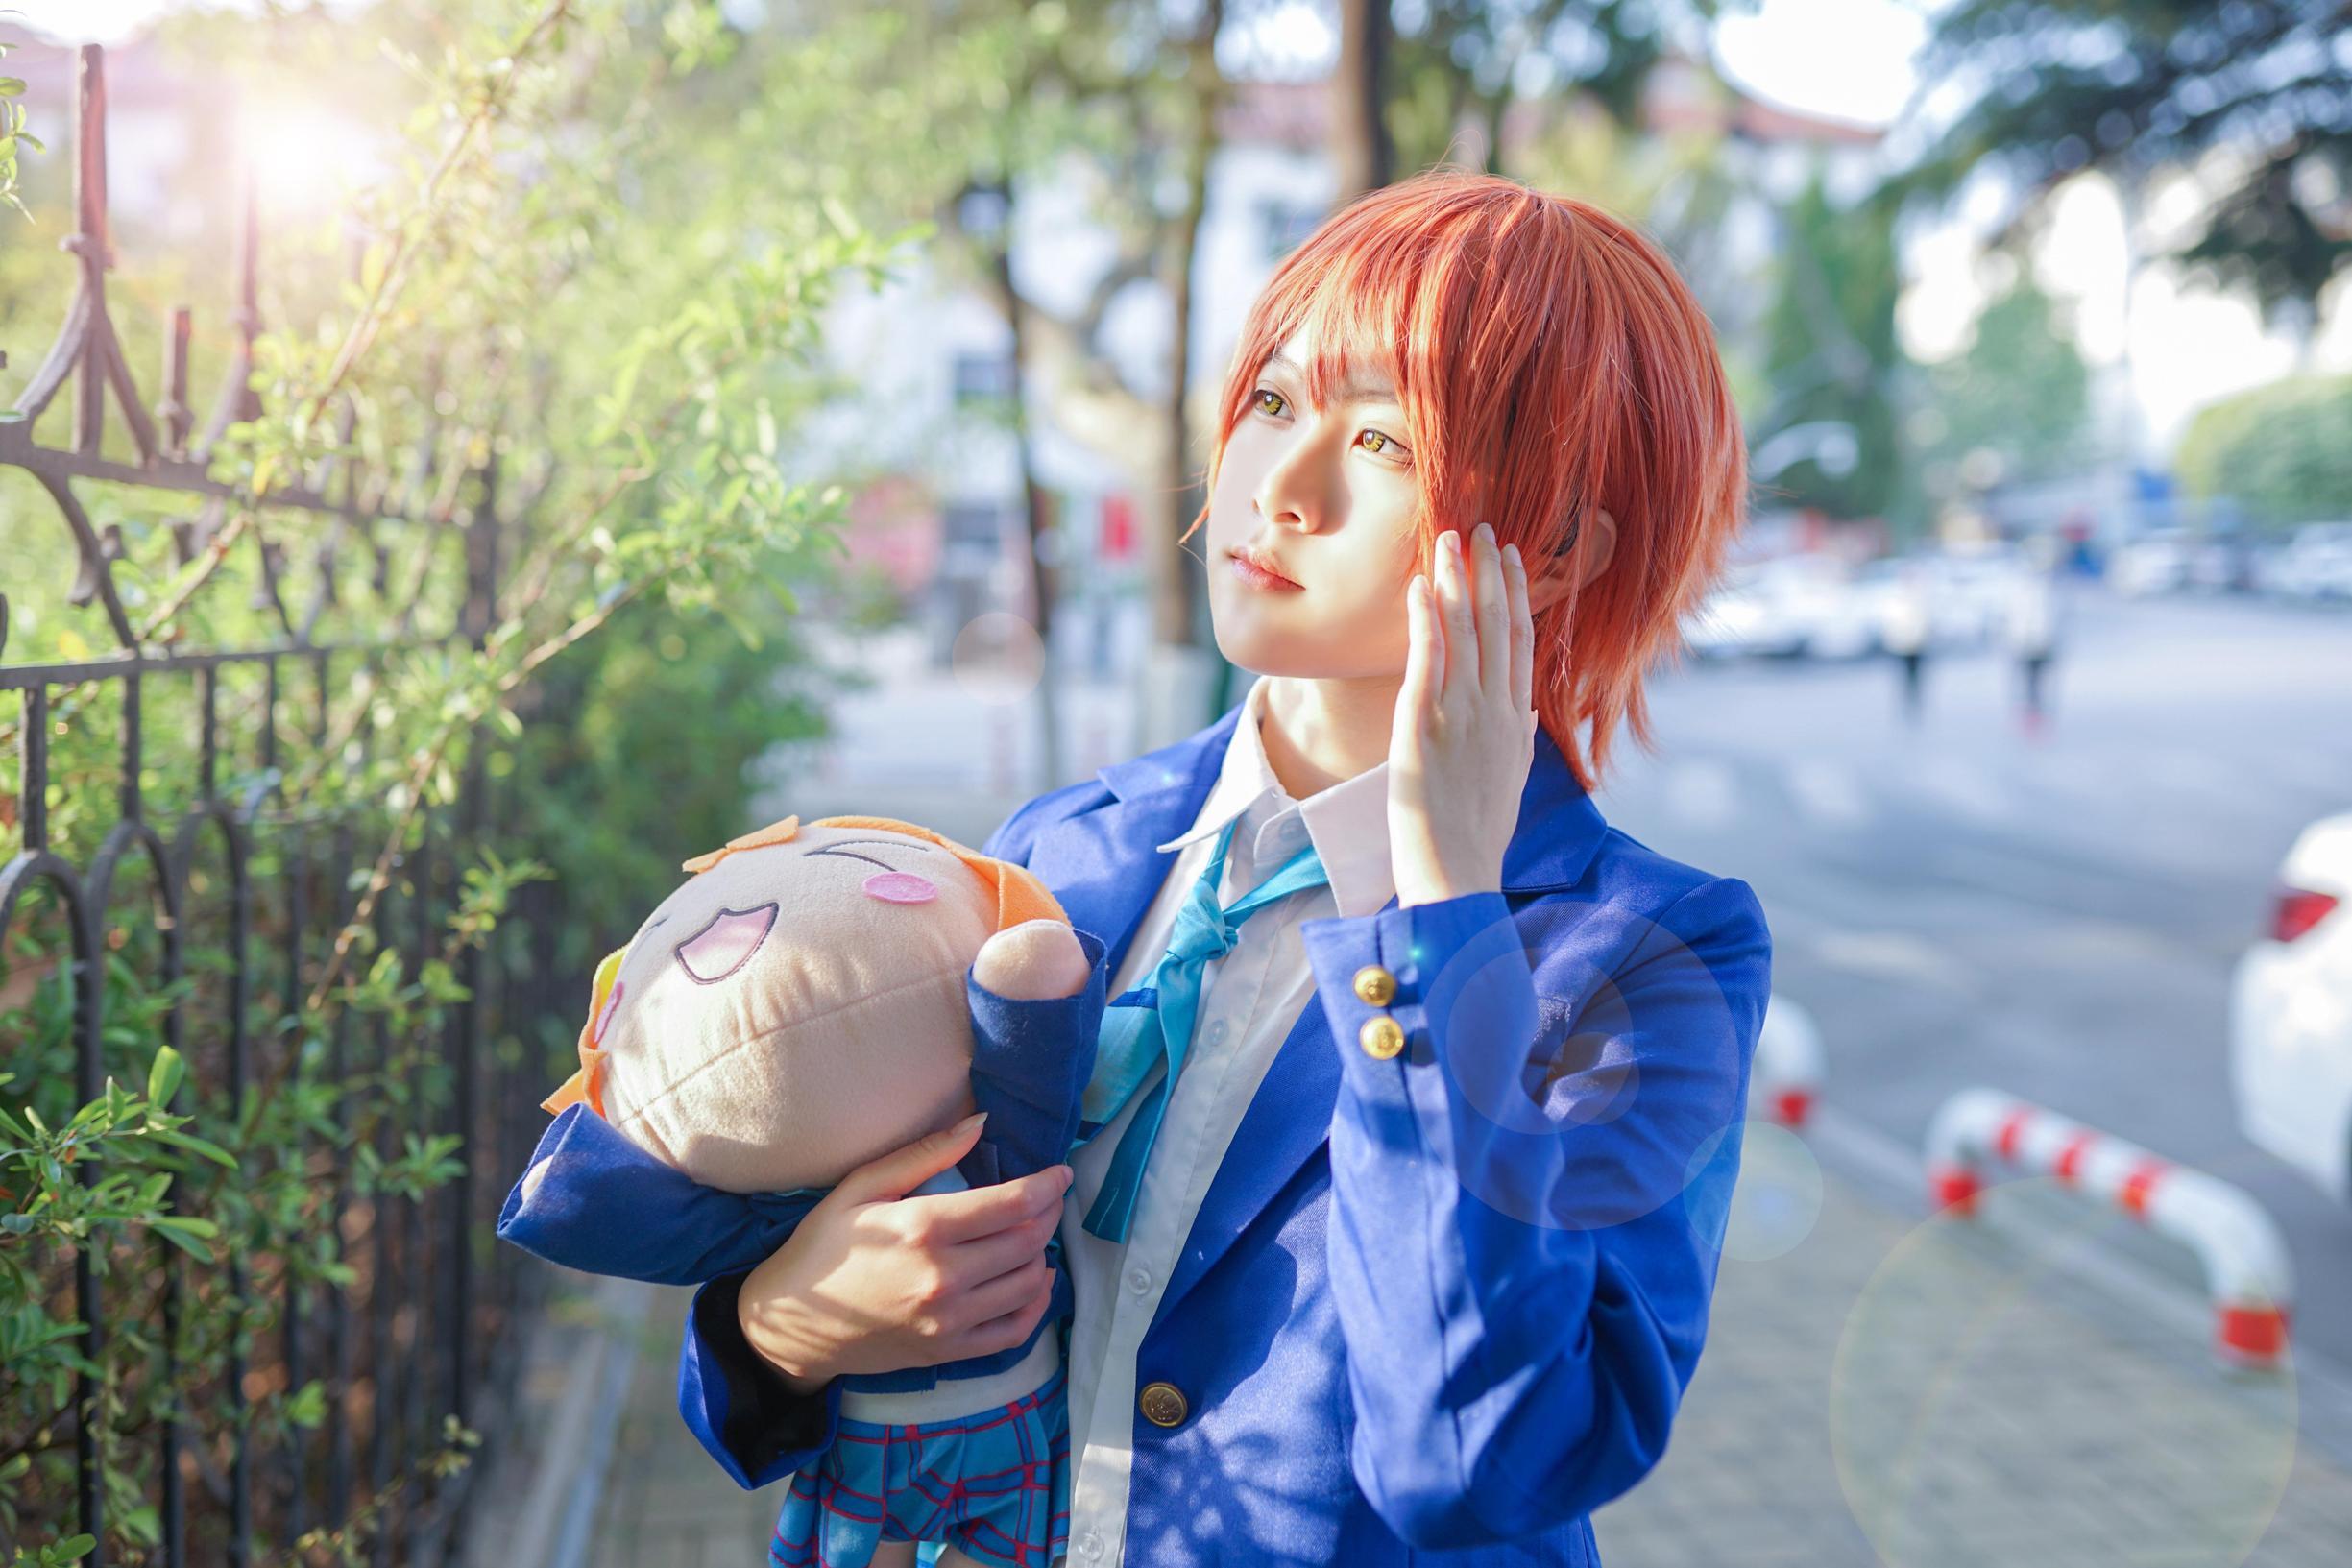 《LOVE LIVE!》正片cosplay【CN:_李笑颜Lee】-第3张